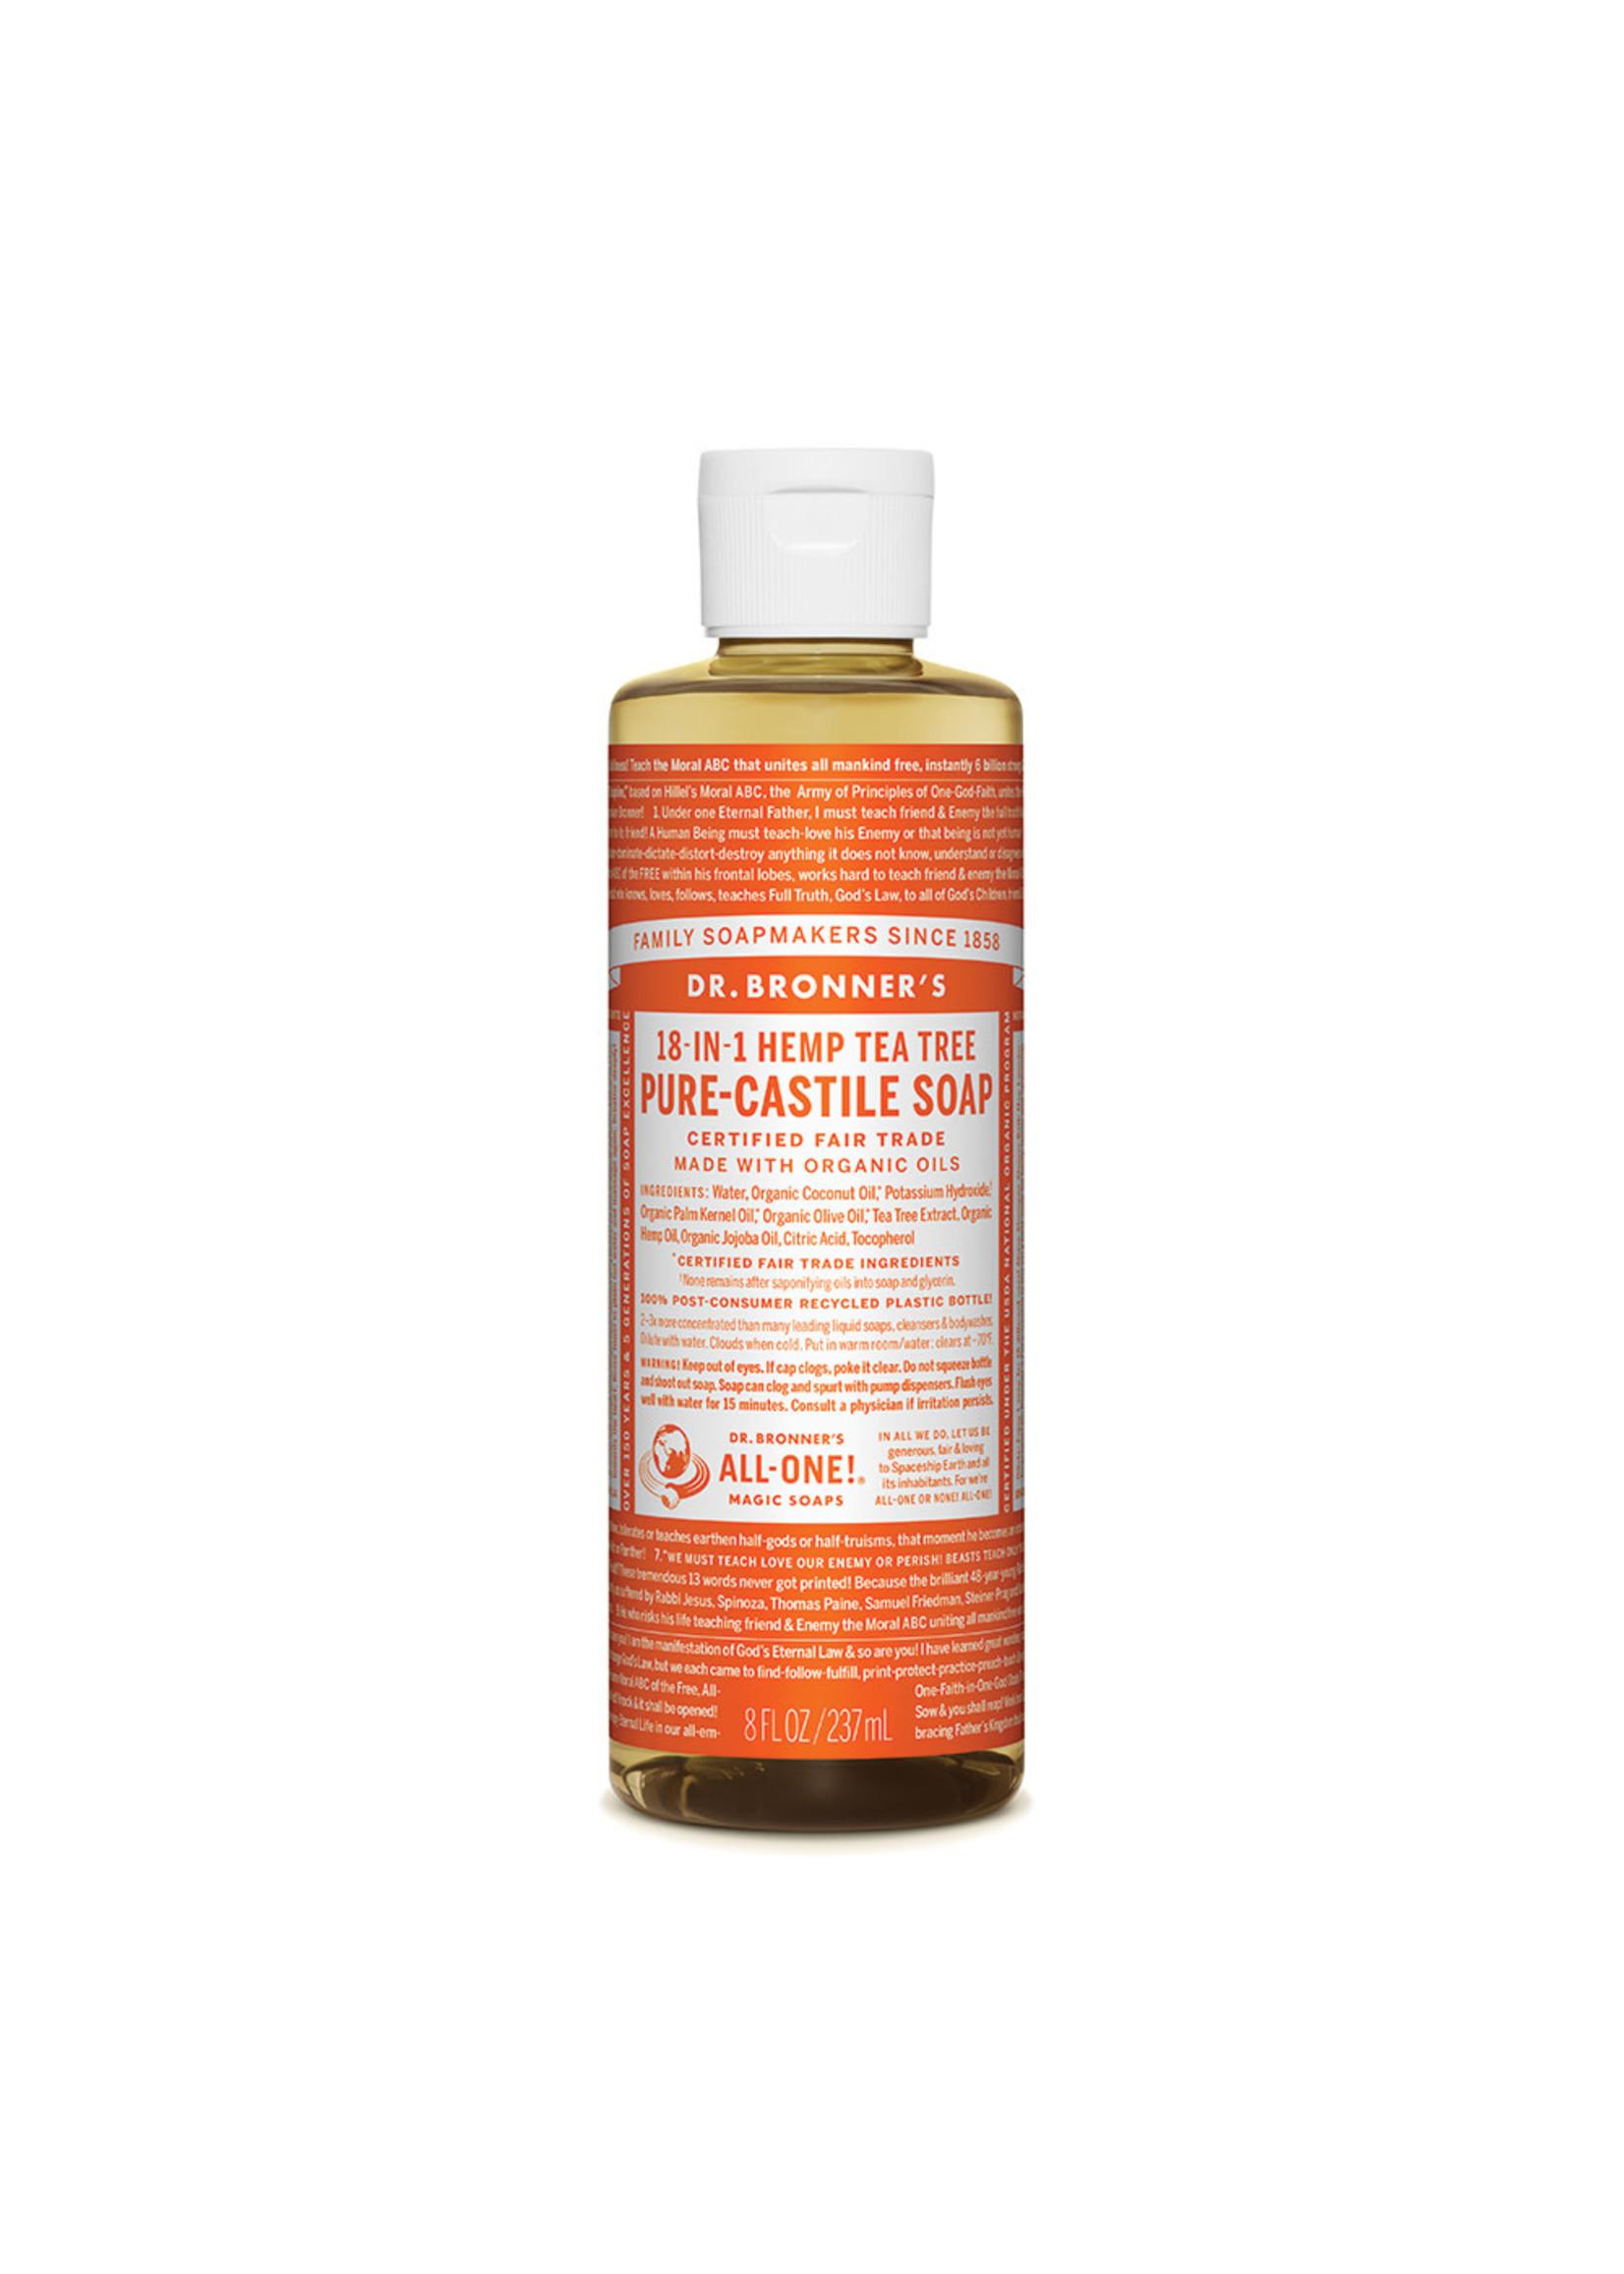 Dr Bronner's Dr Bronner's Pure Castile  Liquid Soap Tea Tree 237 ml                                            ml                                                        mls ORANGE LABEL